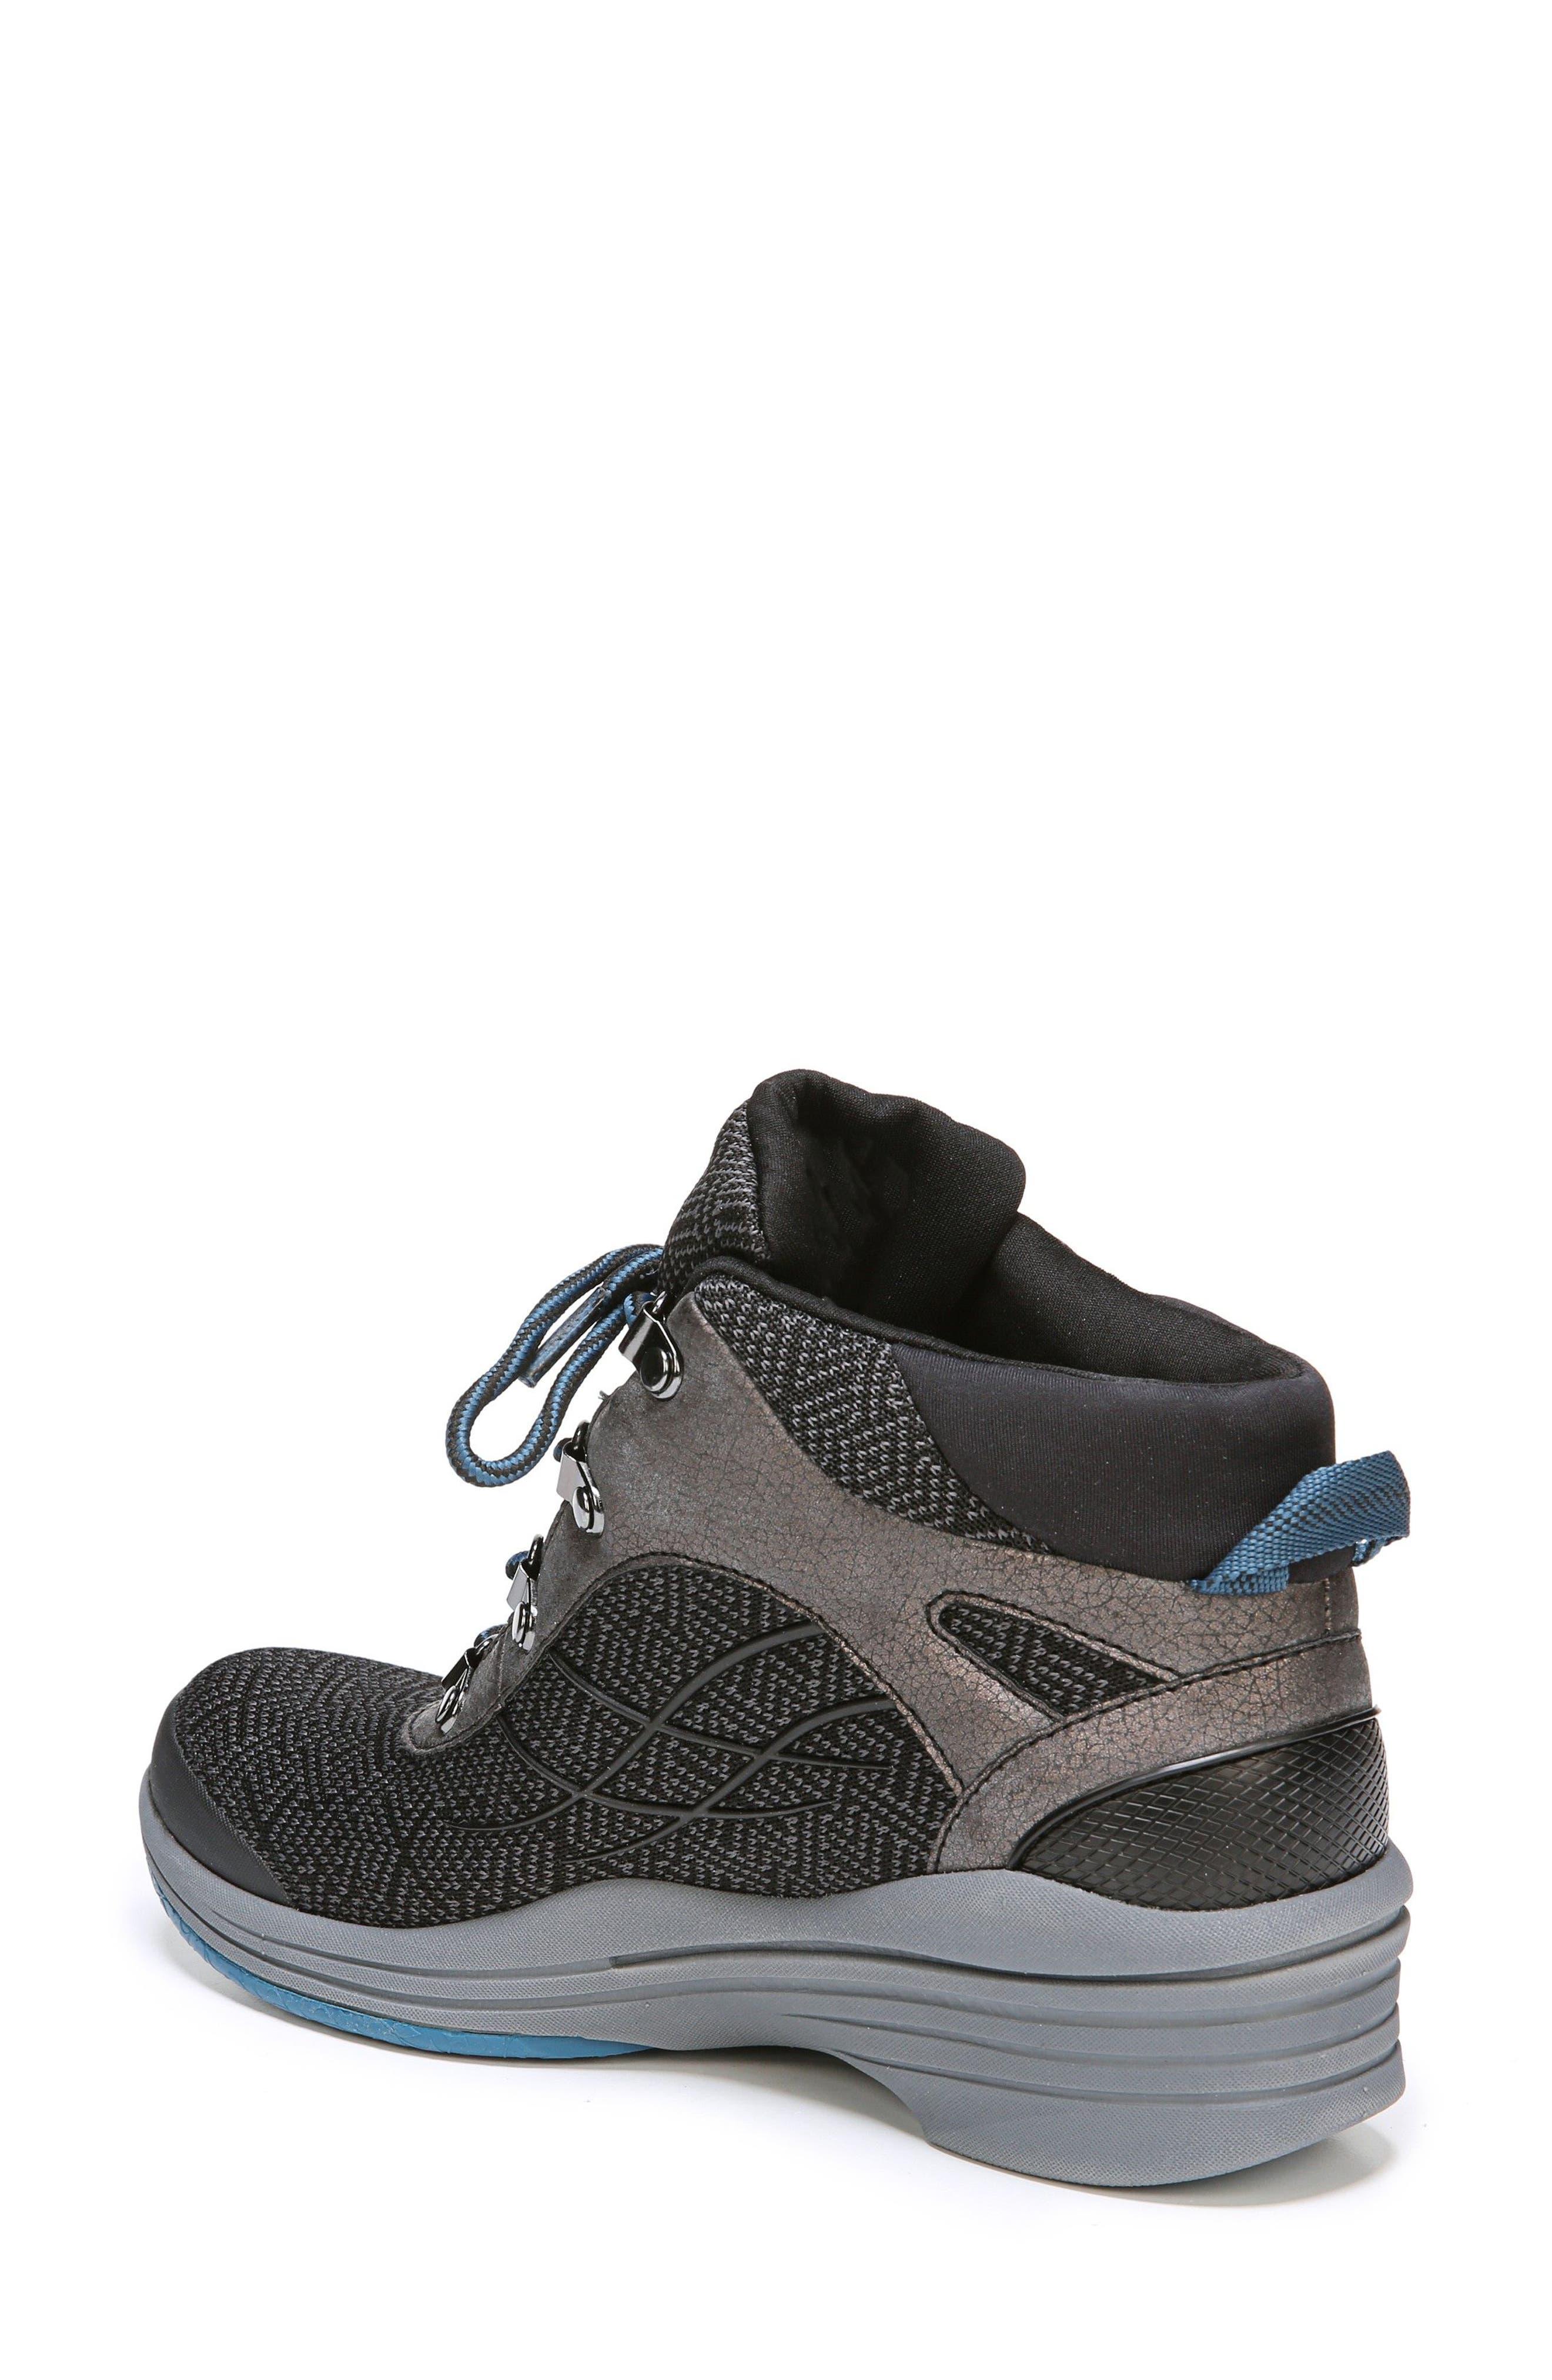 Hotshot Sneaker,                             Alternate thumbnail 2, color,                             002